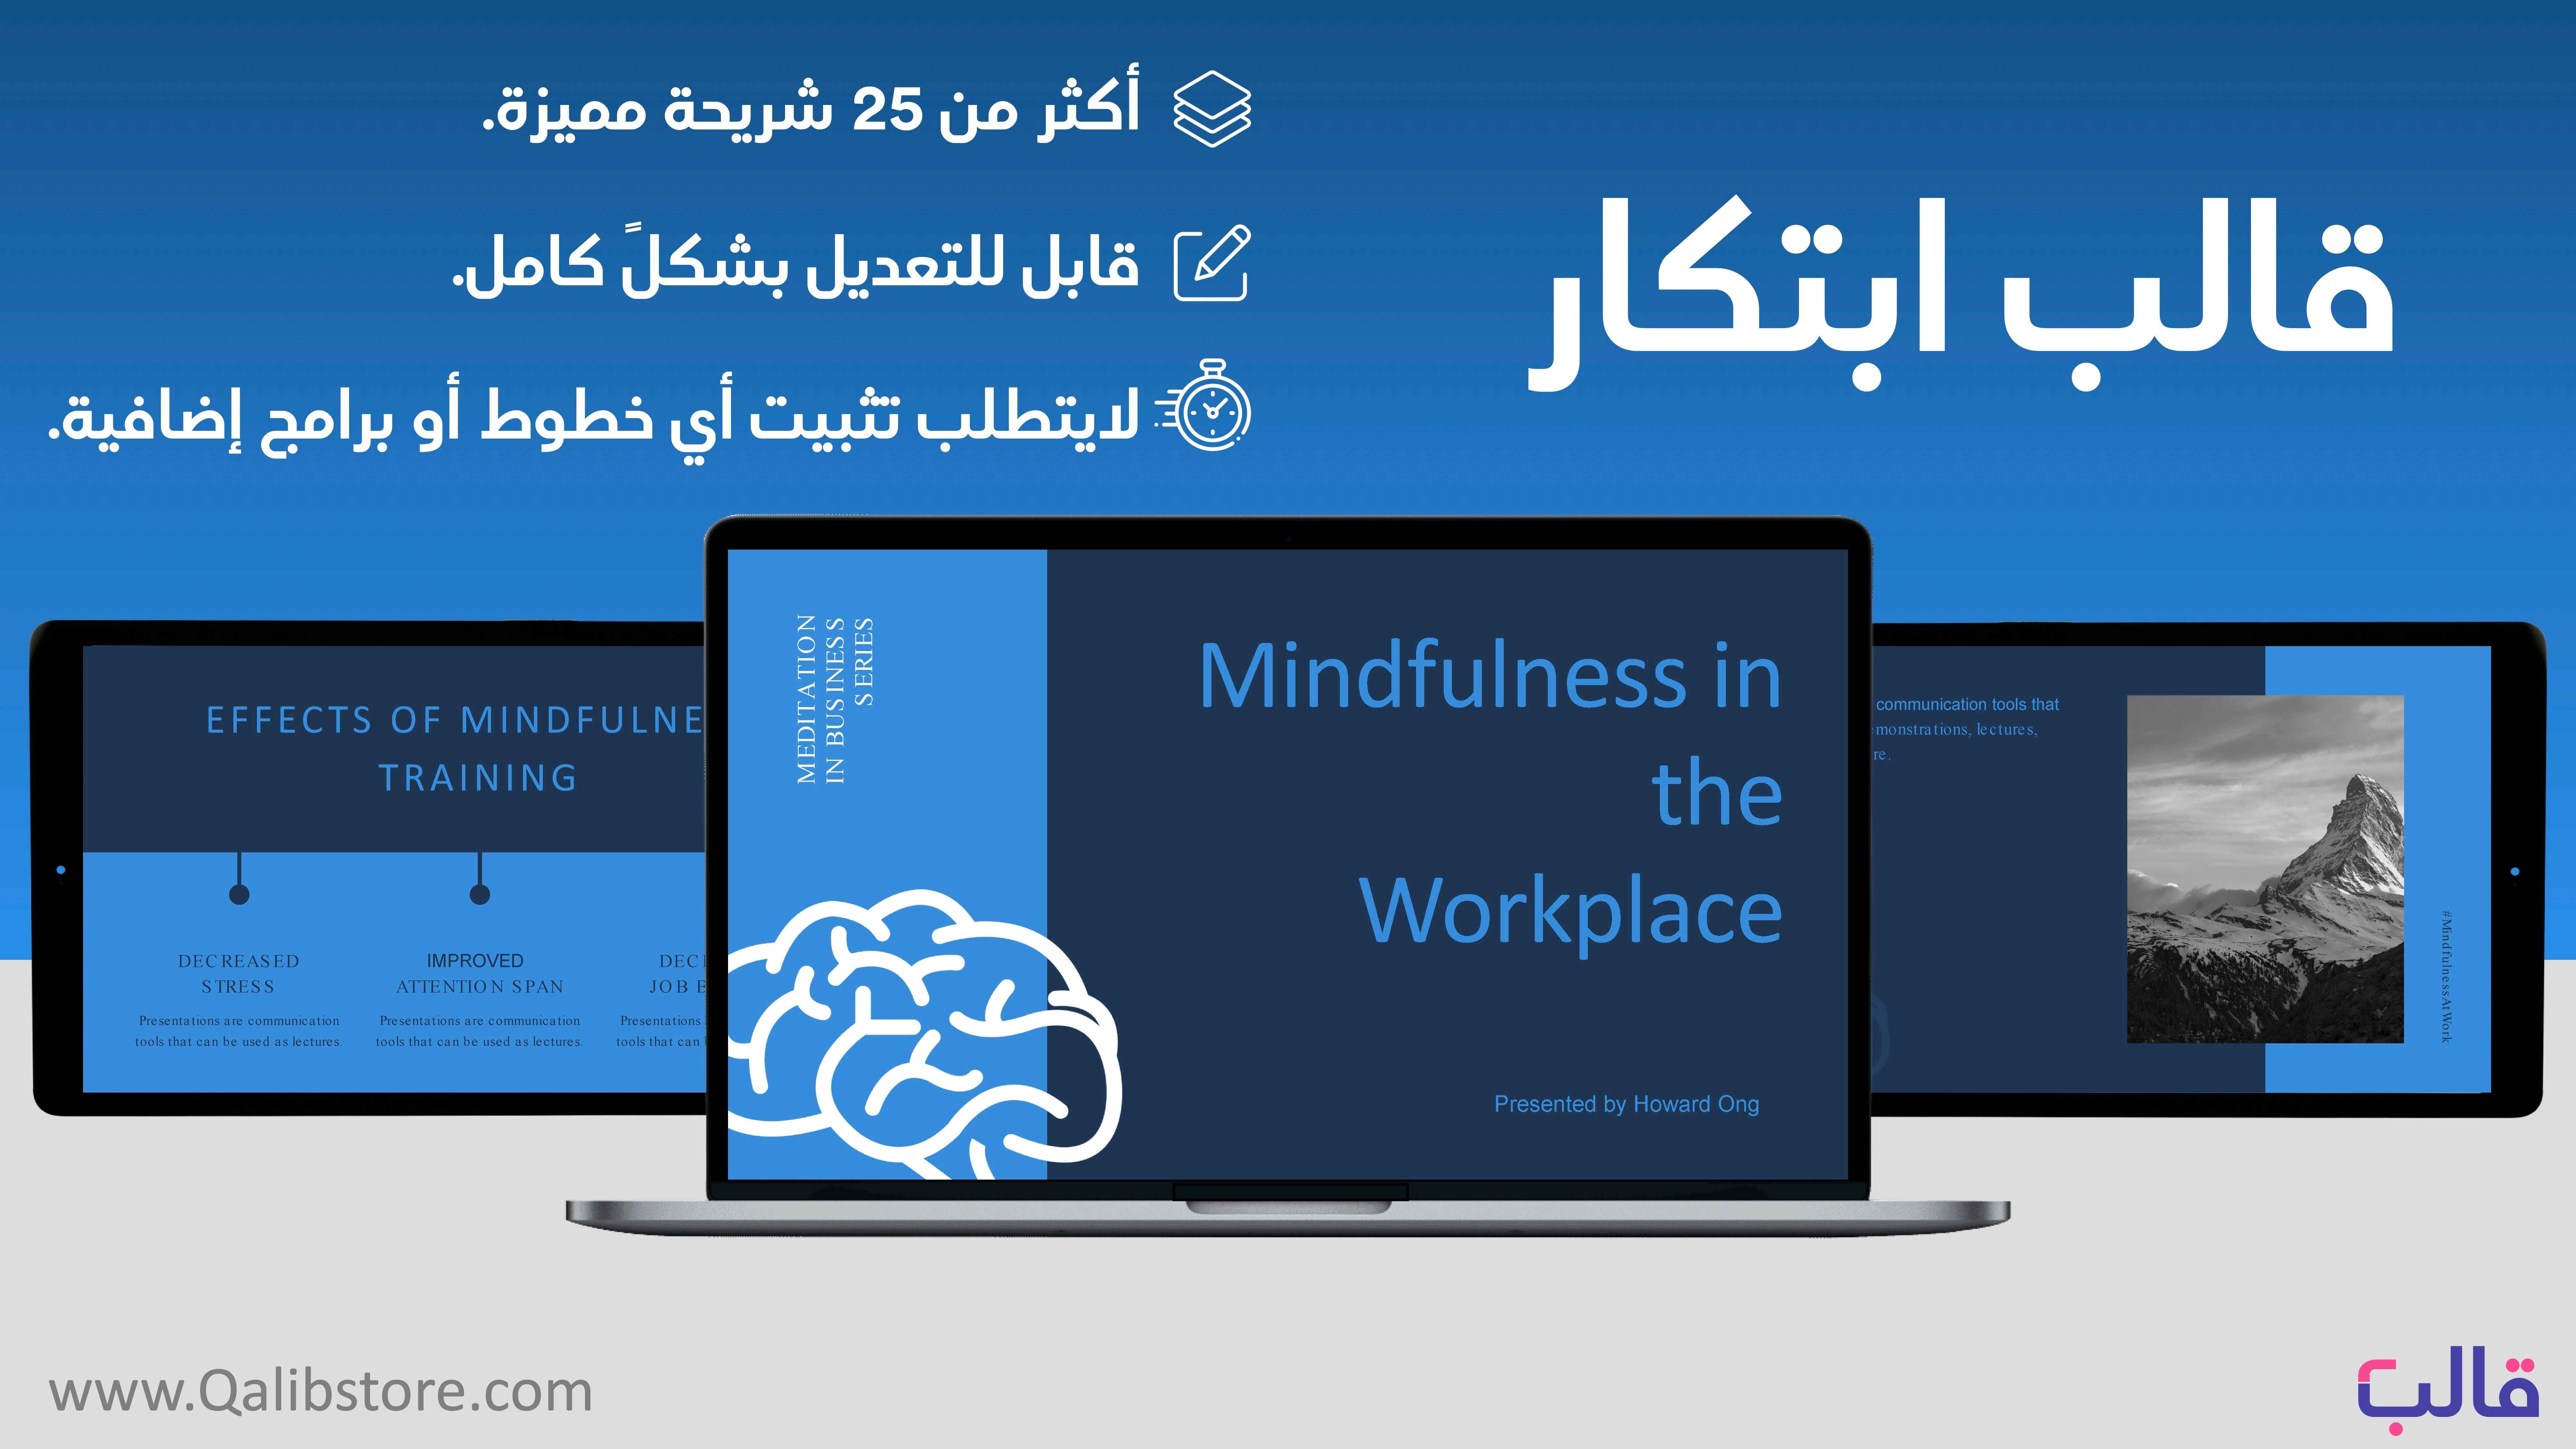 عرض بوربوينت انجليزي ابتكاري مميز للاعمال In 2020 Workplace Mindfulness Train